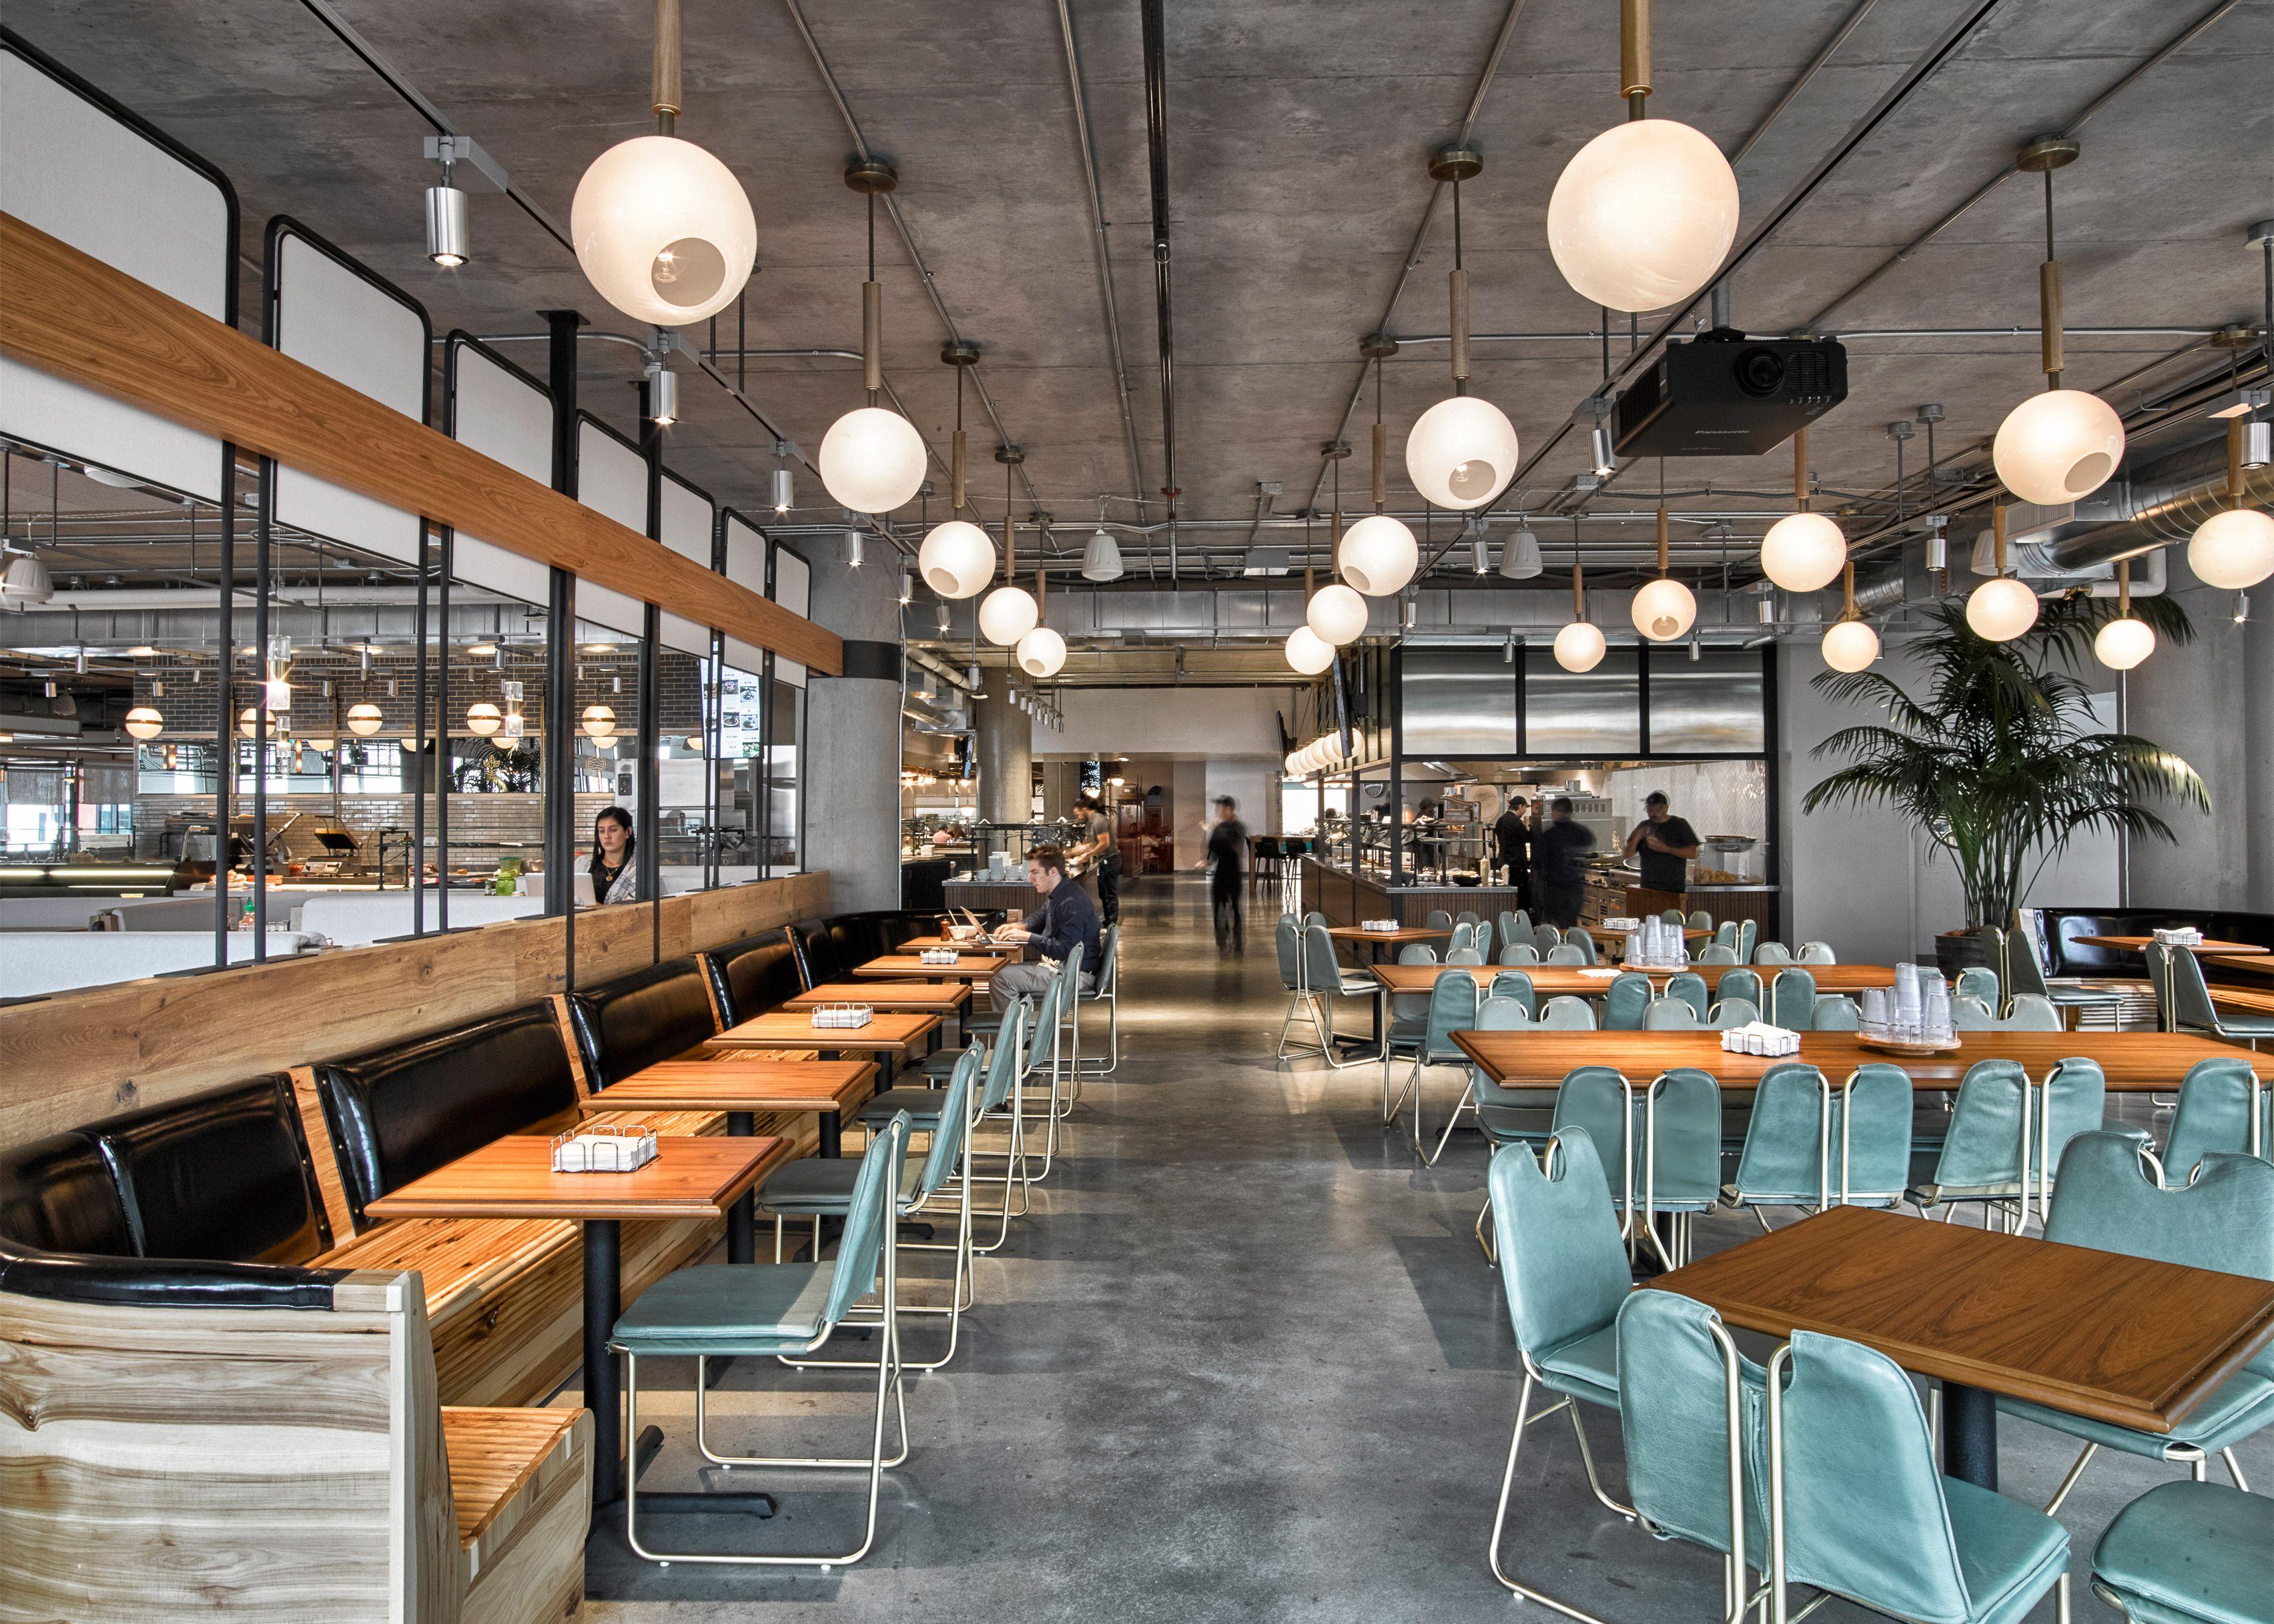 Dropbox Opens Industrial Style Cafeteria At California Headquarters Dezeen Cafeteria Design Cafe Design Interior Design Magazine